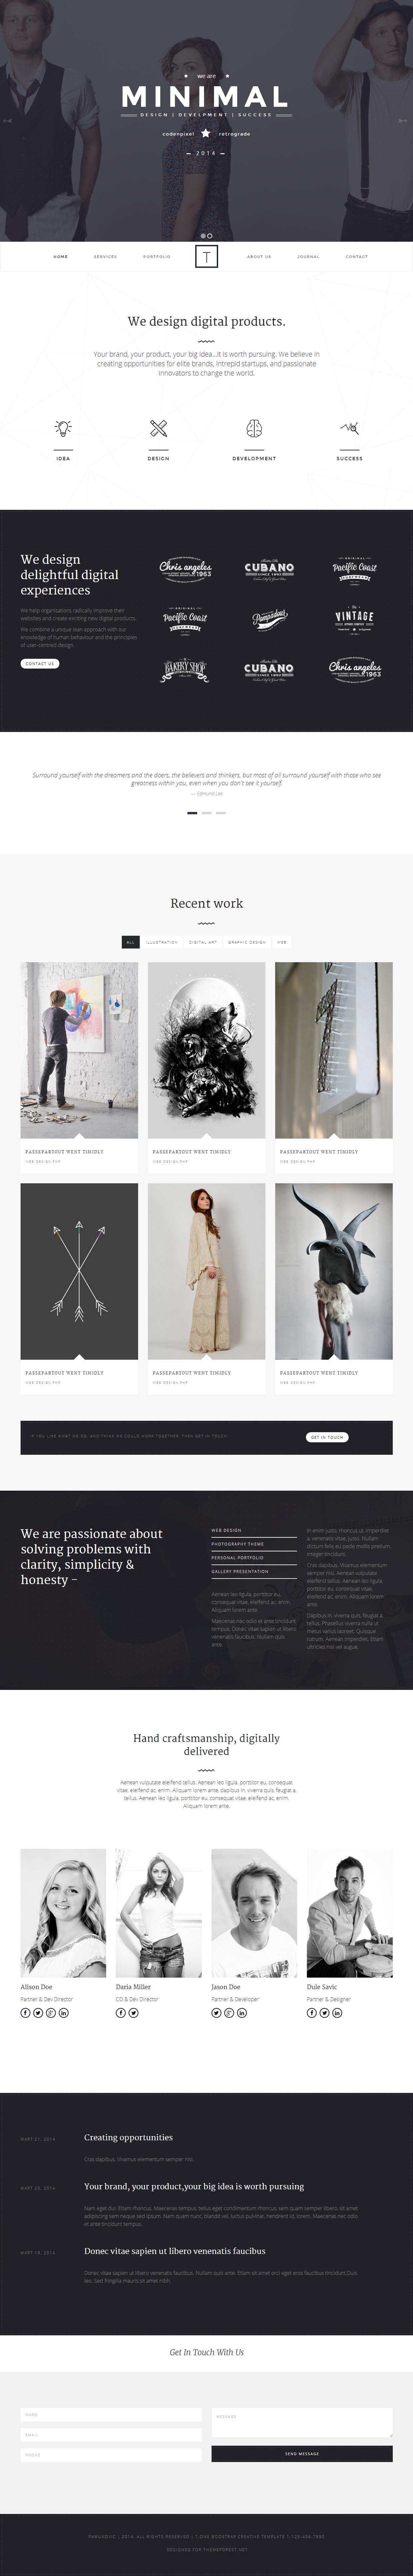 30 Best Simple Wordpress Themes Of 2014 Design Web Designs